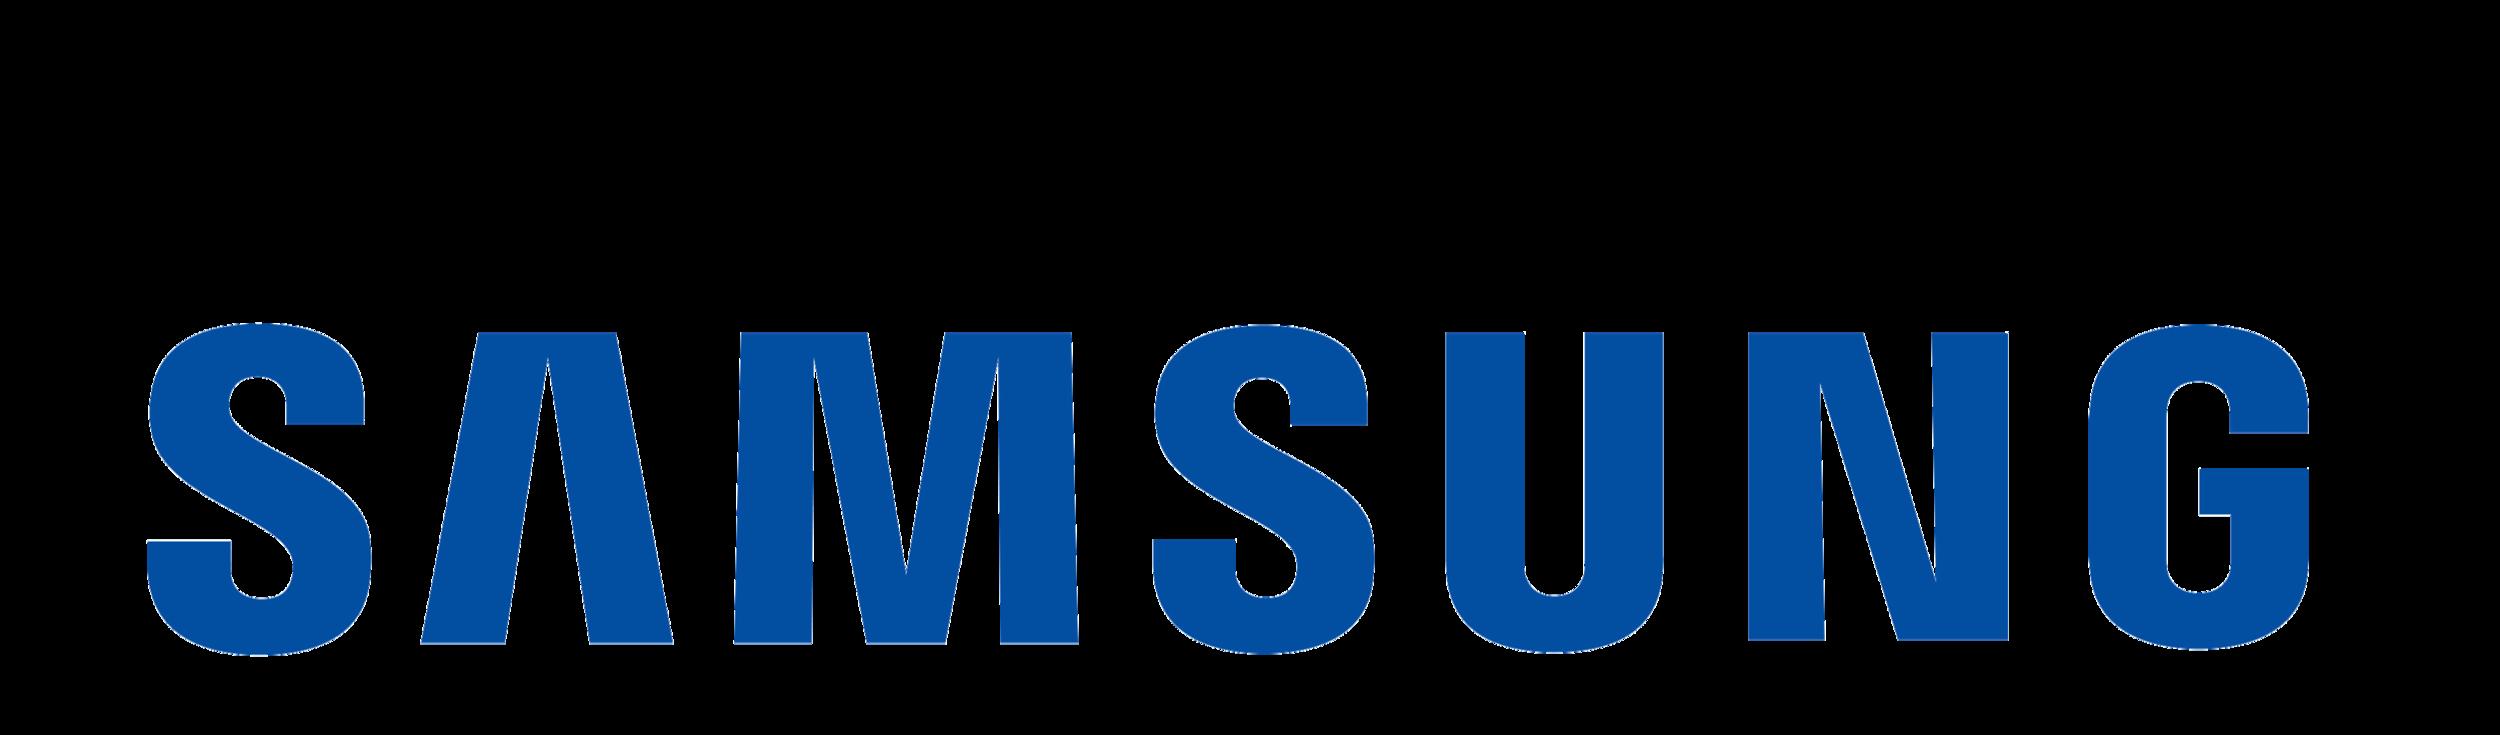 samsung-logo trans.png